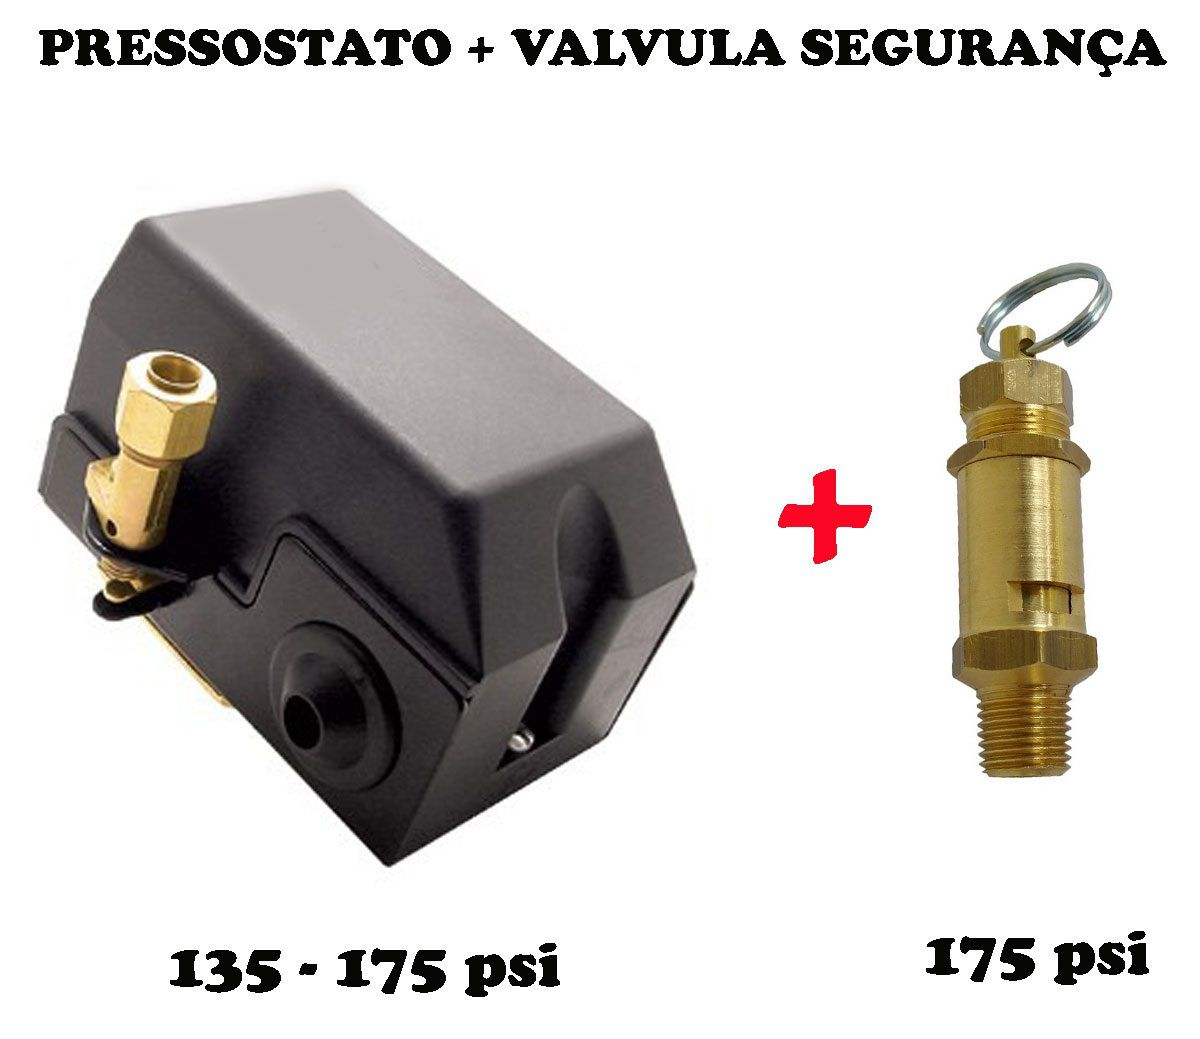 Pressostato Automático Alav. + Válvula Segurança 135- 175psi